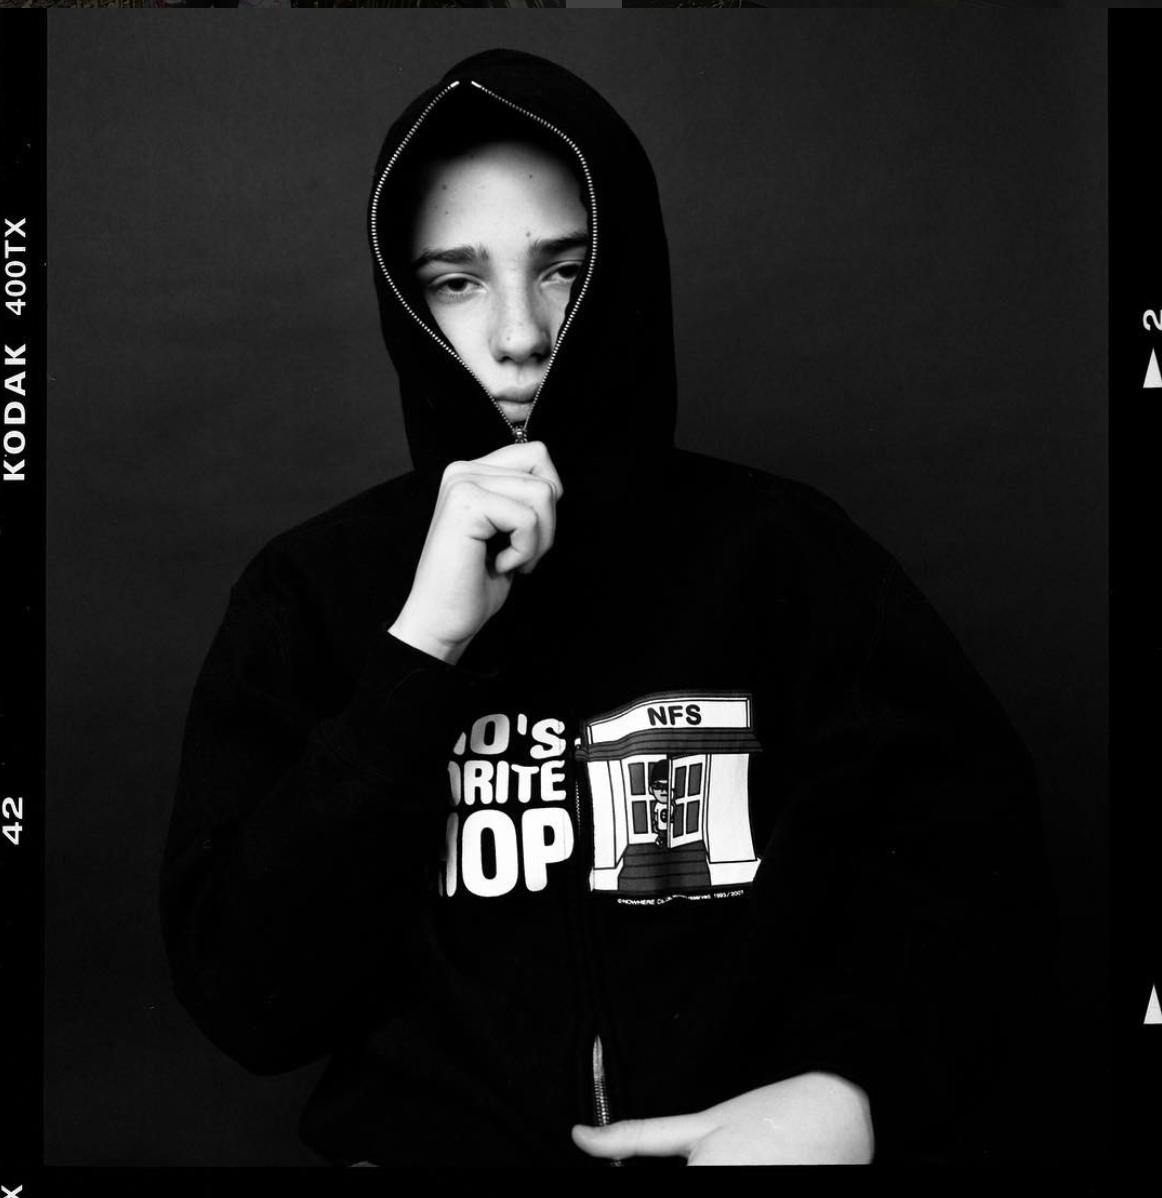 Asato Iida - 18 More Poses for Male Models - FilterGrade